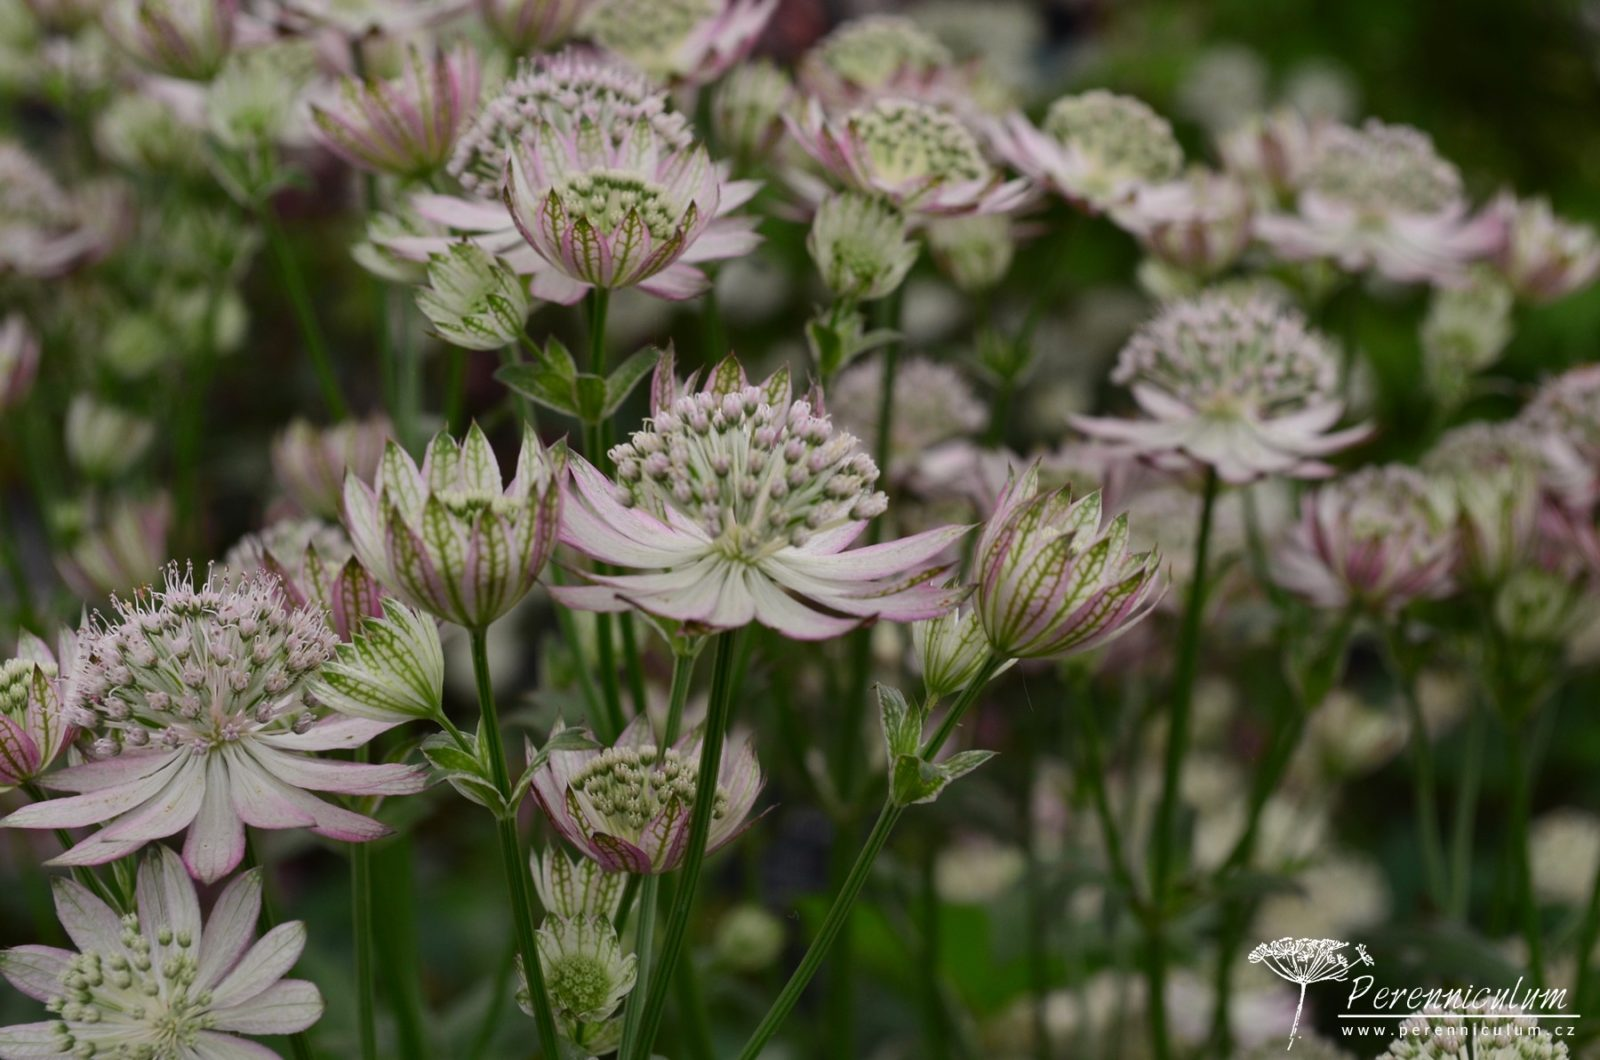 <em>Astrantia major</em> var.  <em>rosea</em> kvete světle růžově.